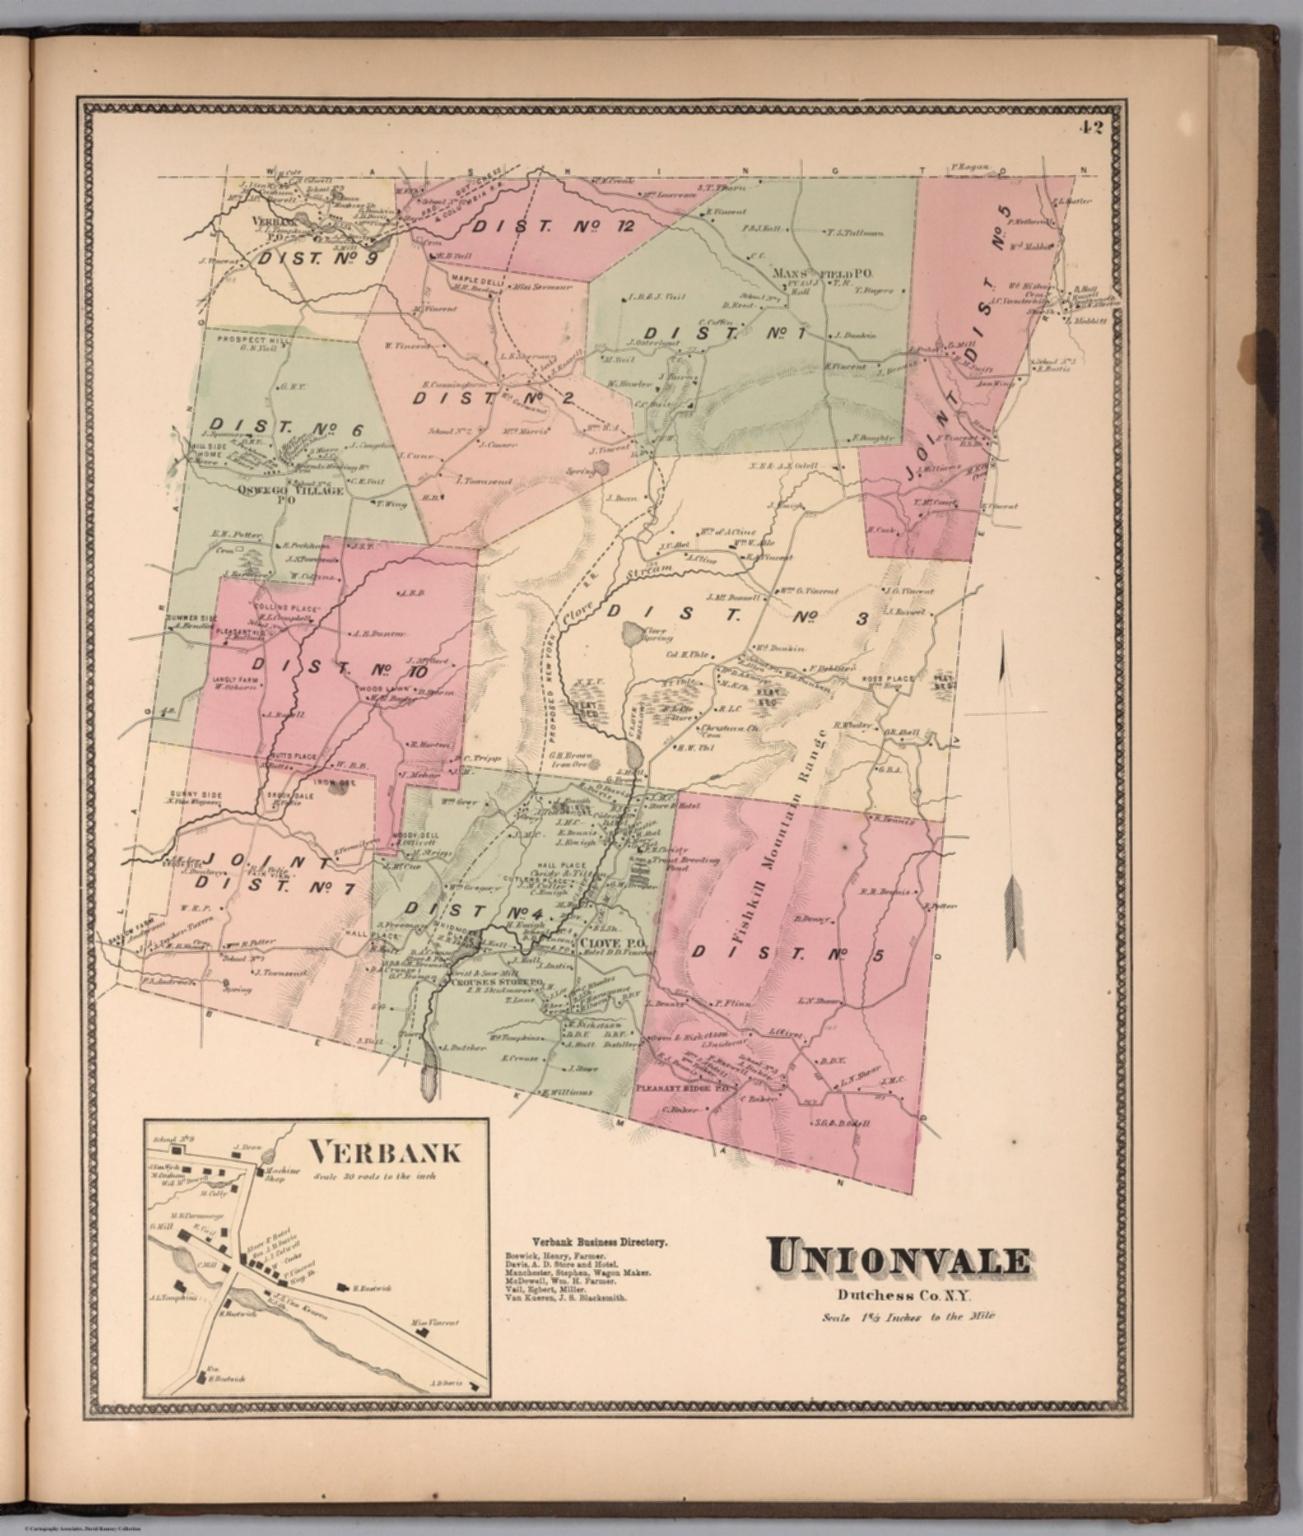 Unionvale, Dutchess County, New York. (inset) Verbank. - David ...